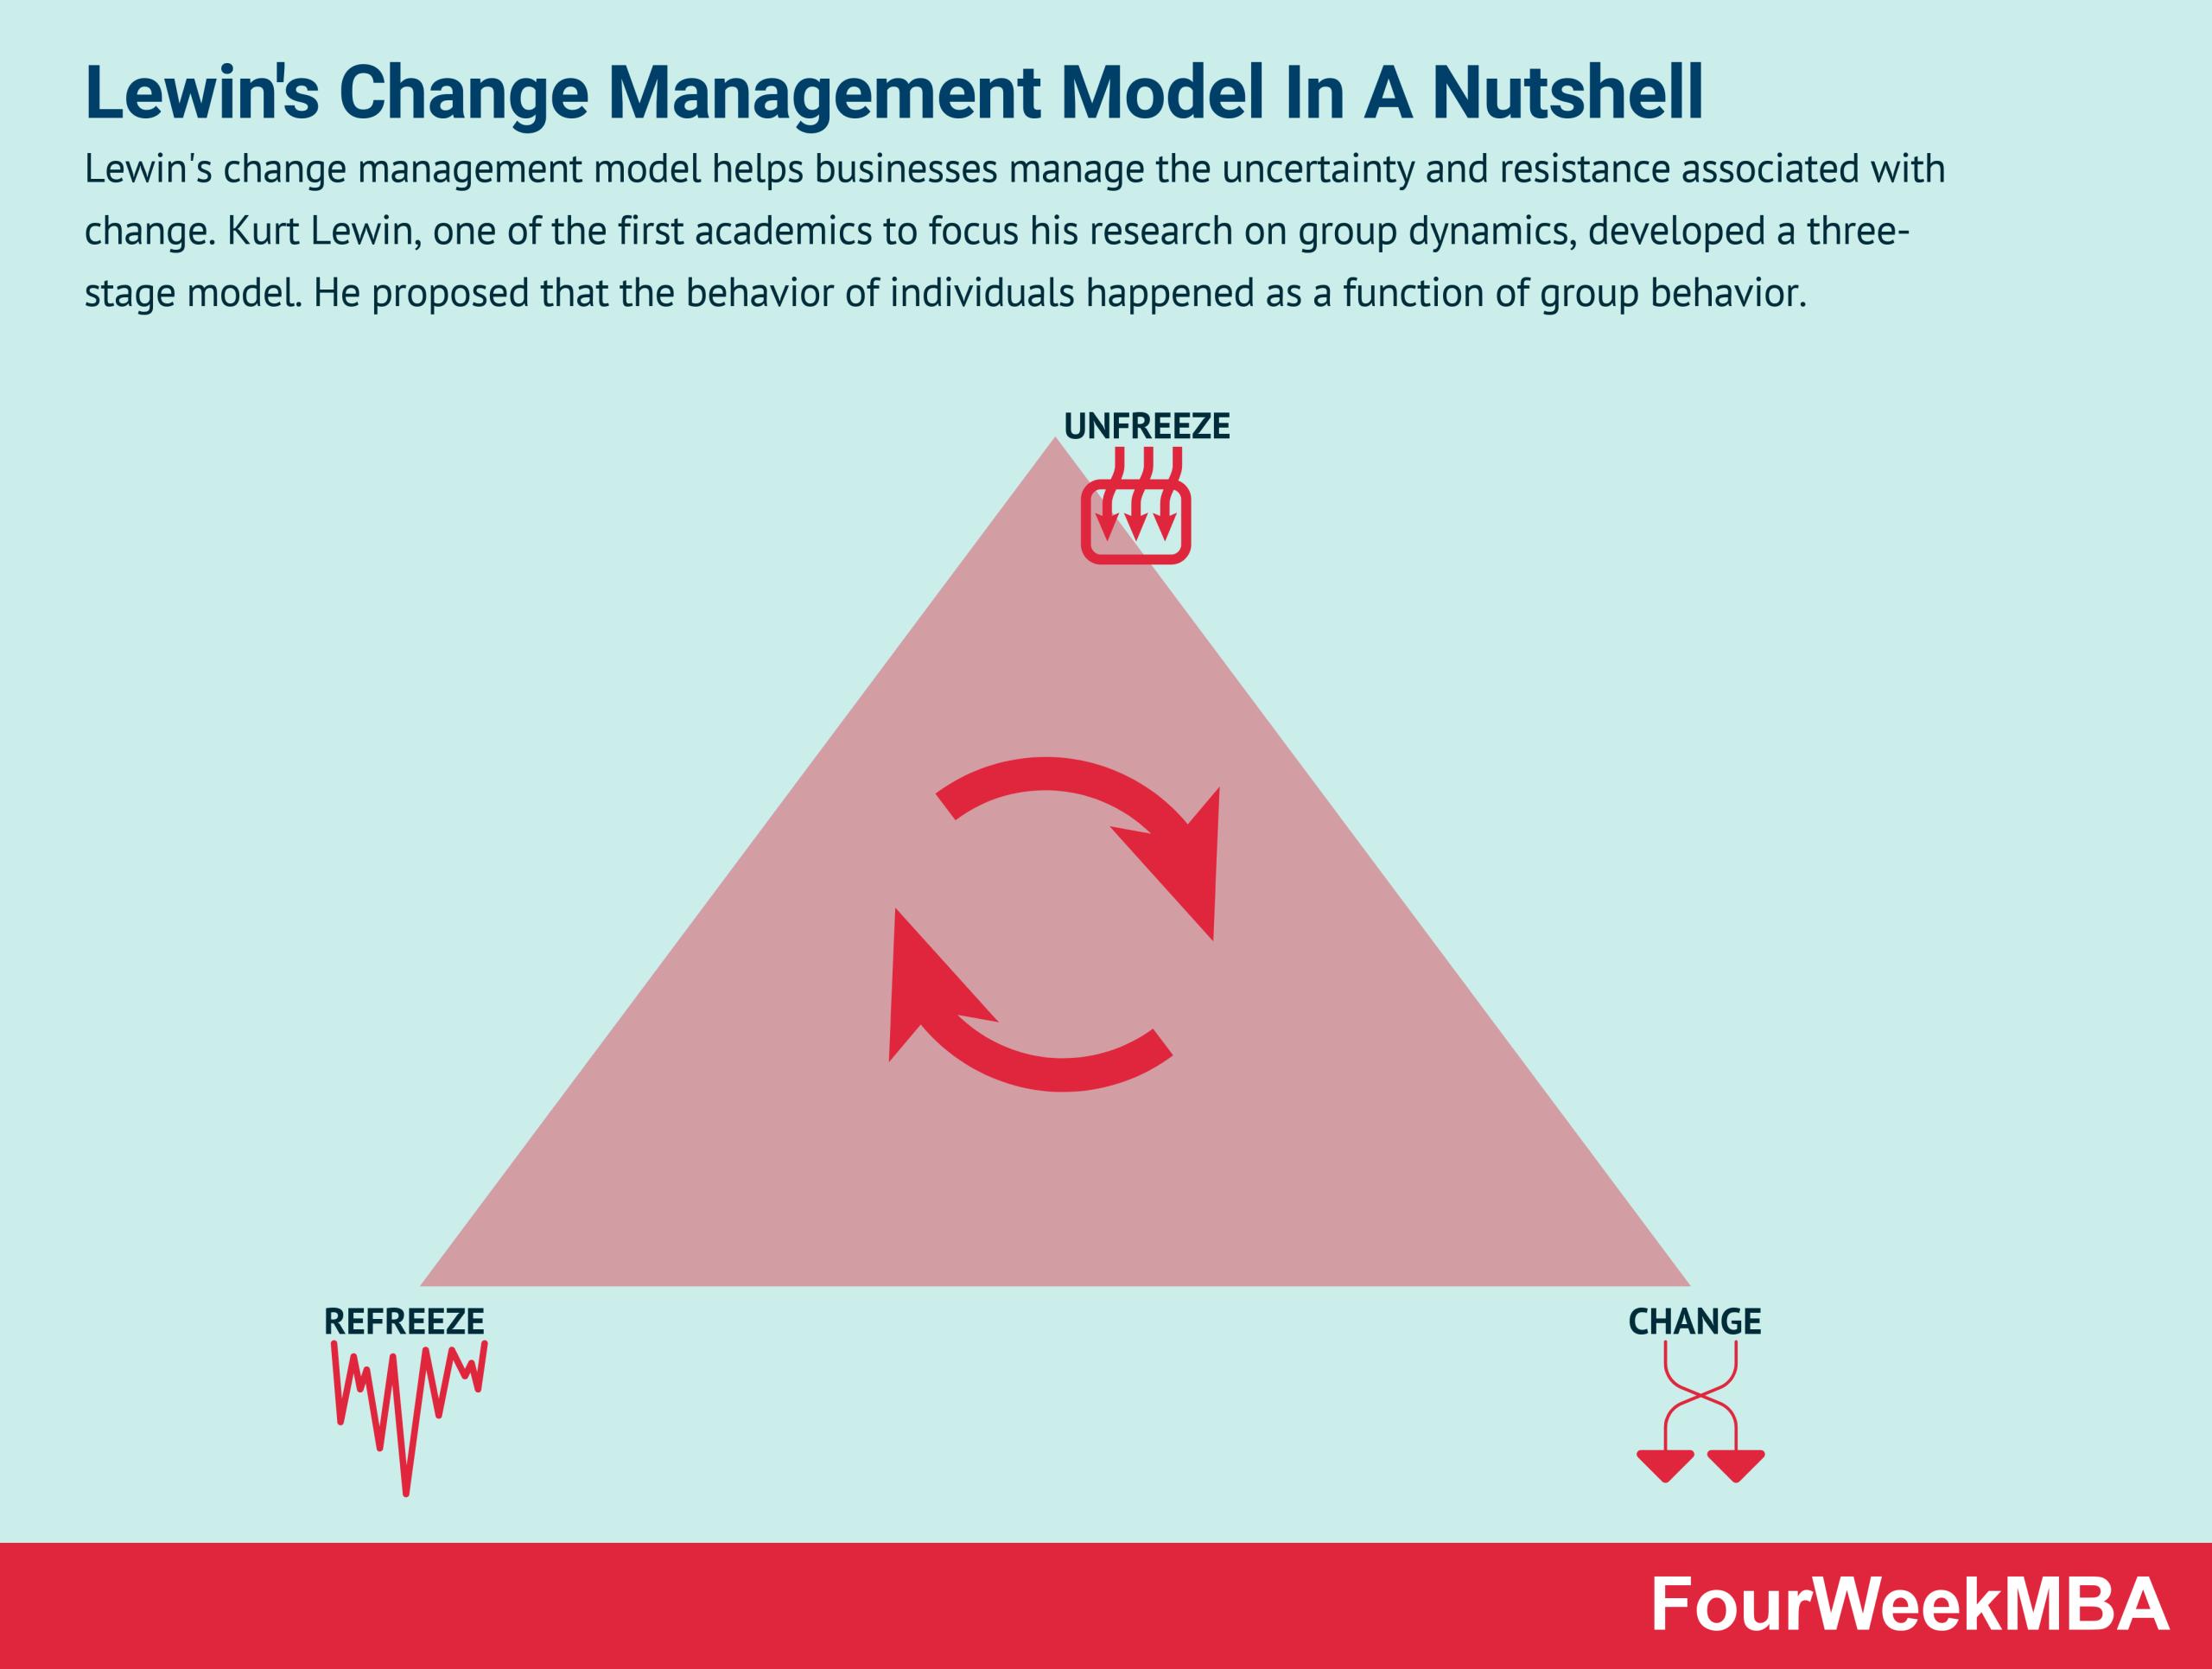 Lewin's Change Management Model In A Nutshell